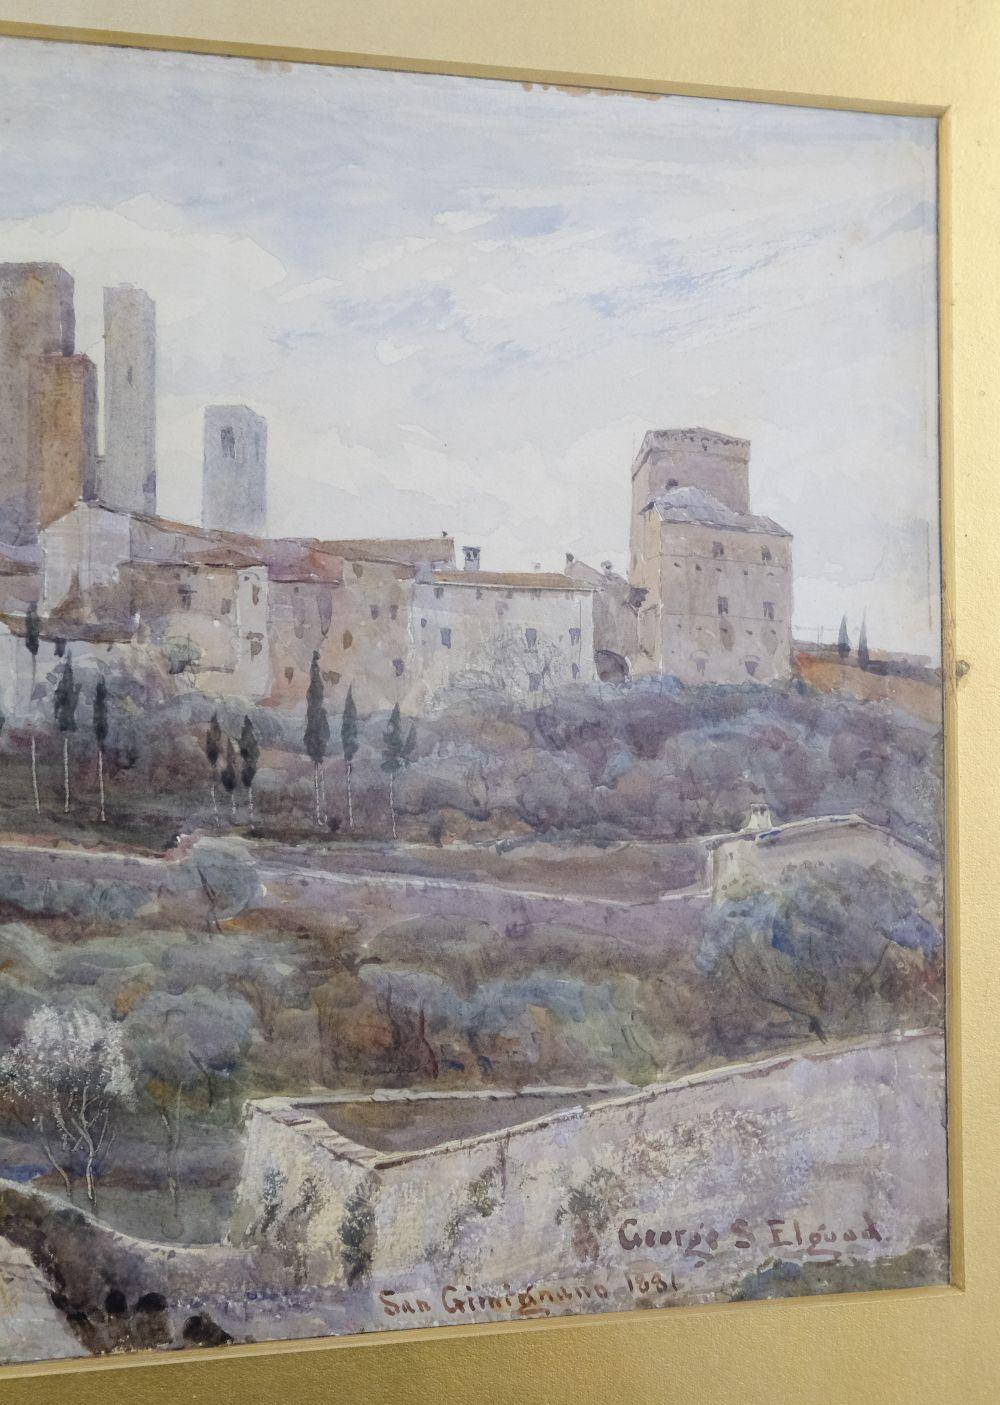 * Elgood (George S., 1851-1943). San Gimignano, 1881 - Image 5 of 6